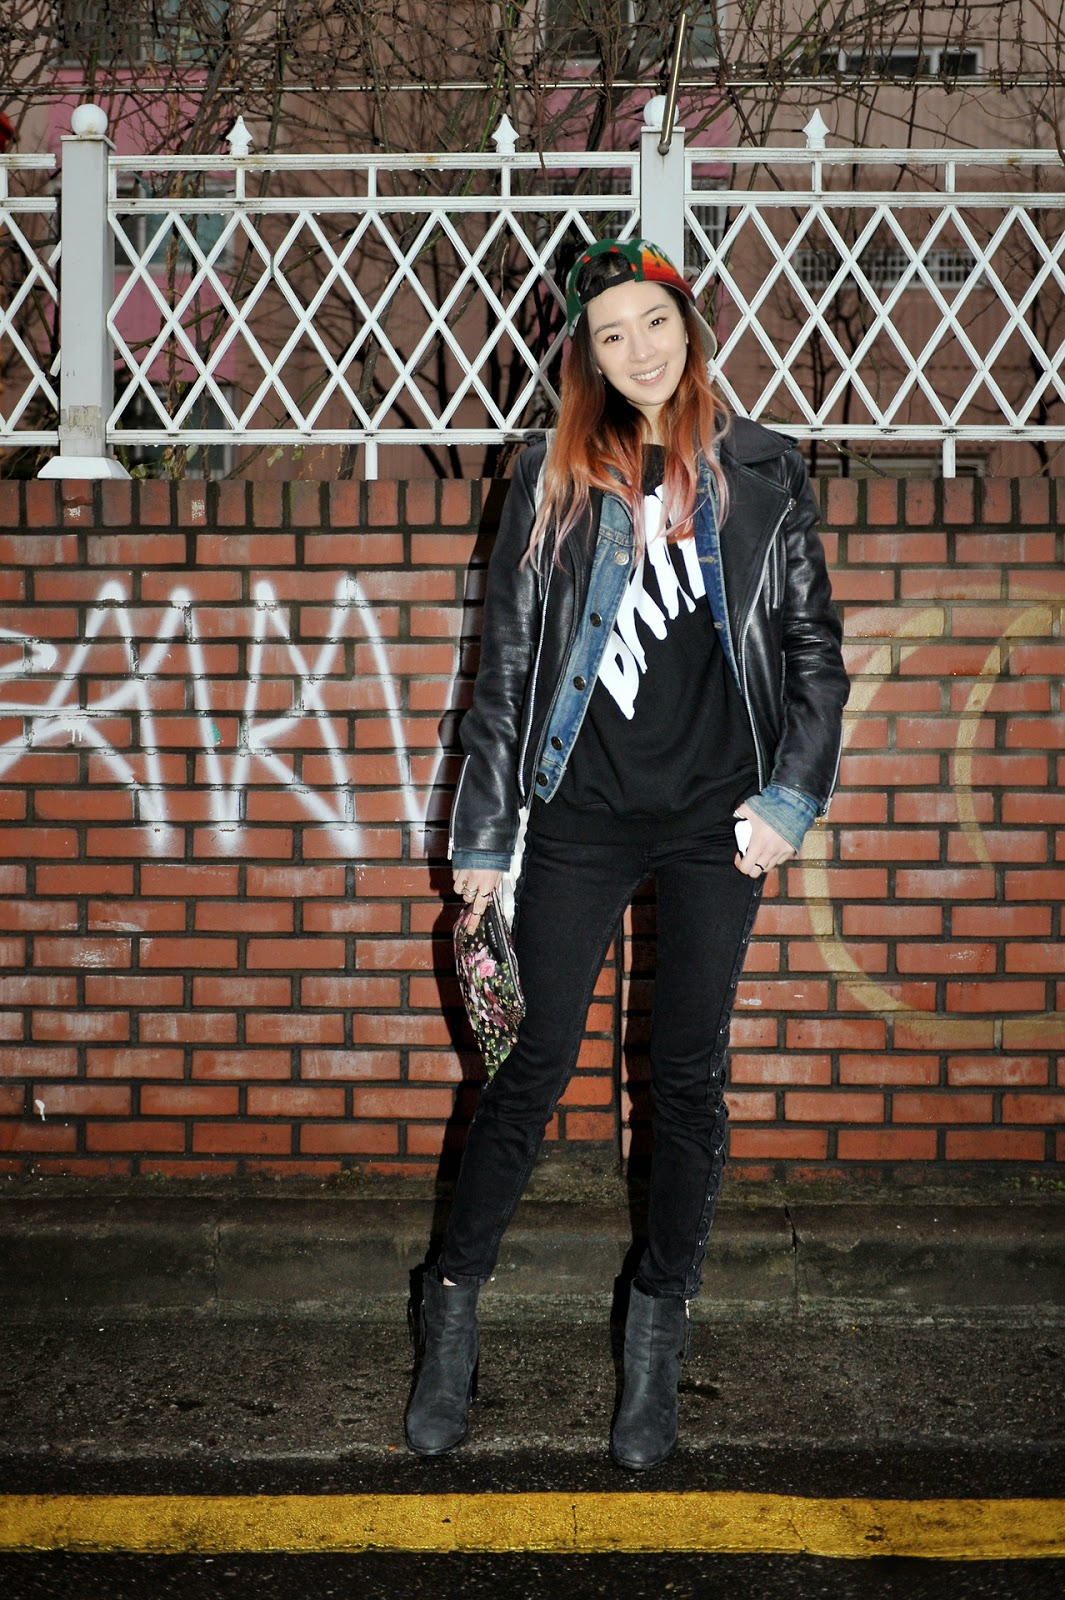 Street style Korean outfits for teenage girls - Girlcheck |Korean Street Fashion 2014 For Girls